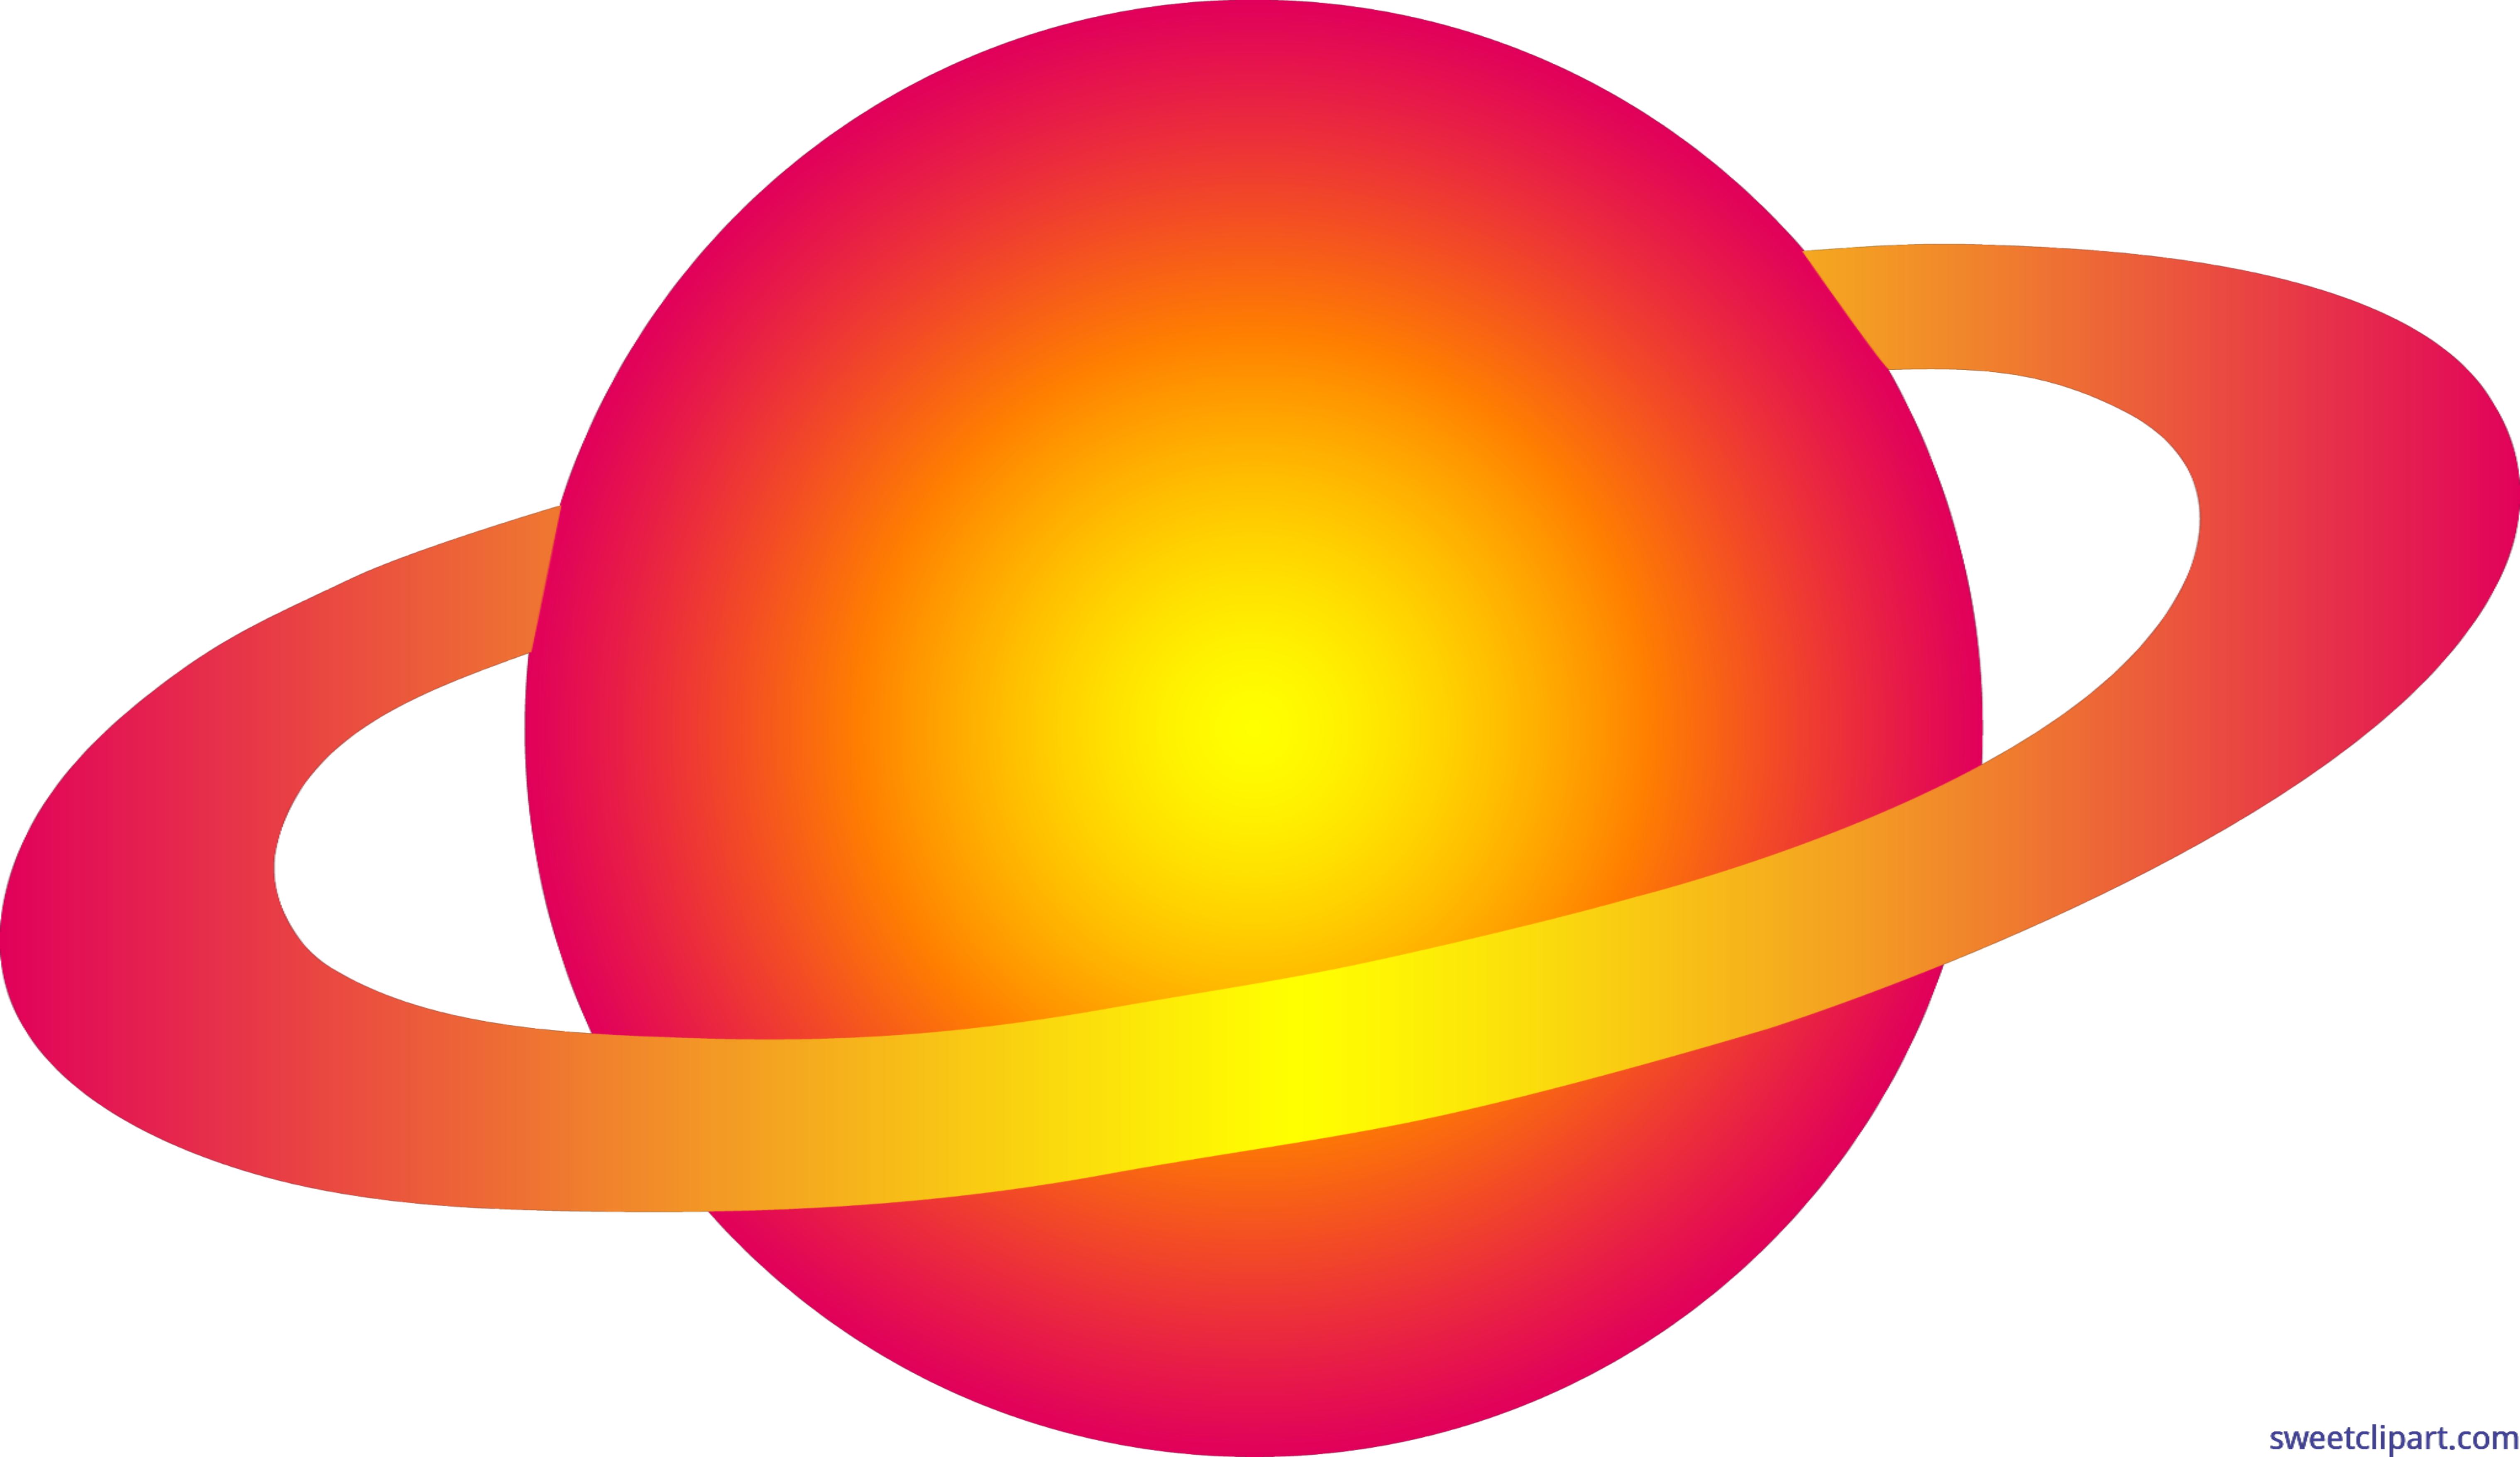 Transparent planet clipart royalty free download Planet Jupiter Clip art - both clipart png download - 6071 ... royalty free download